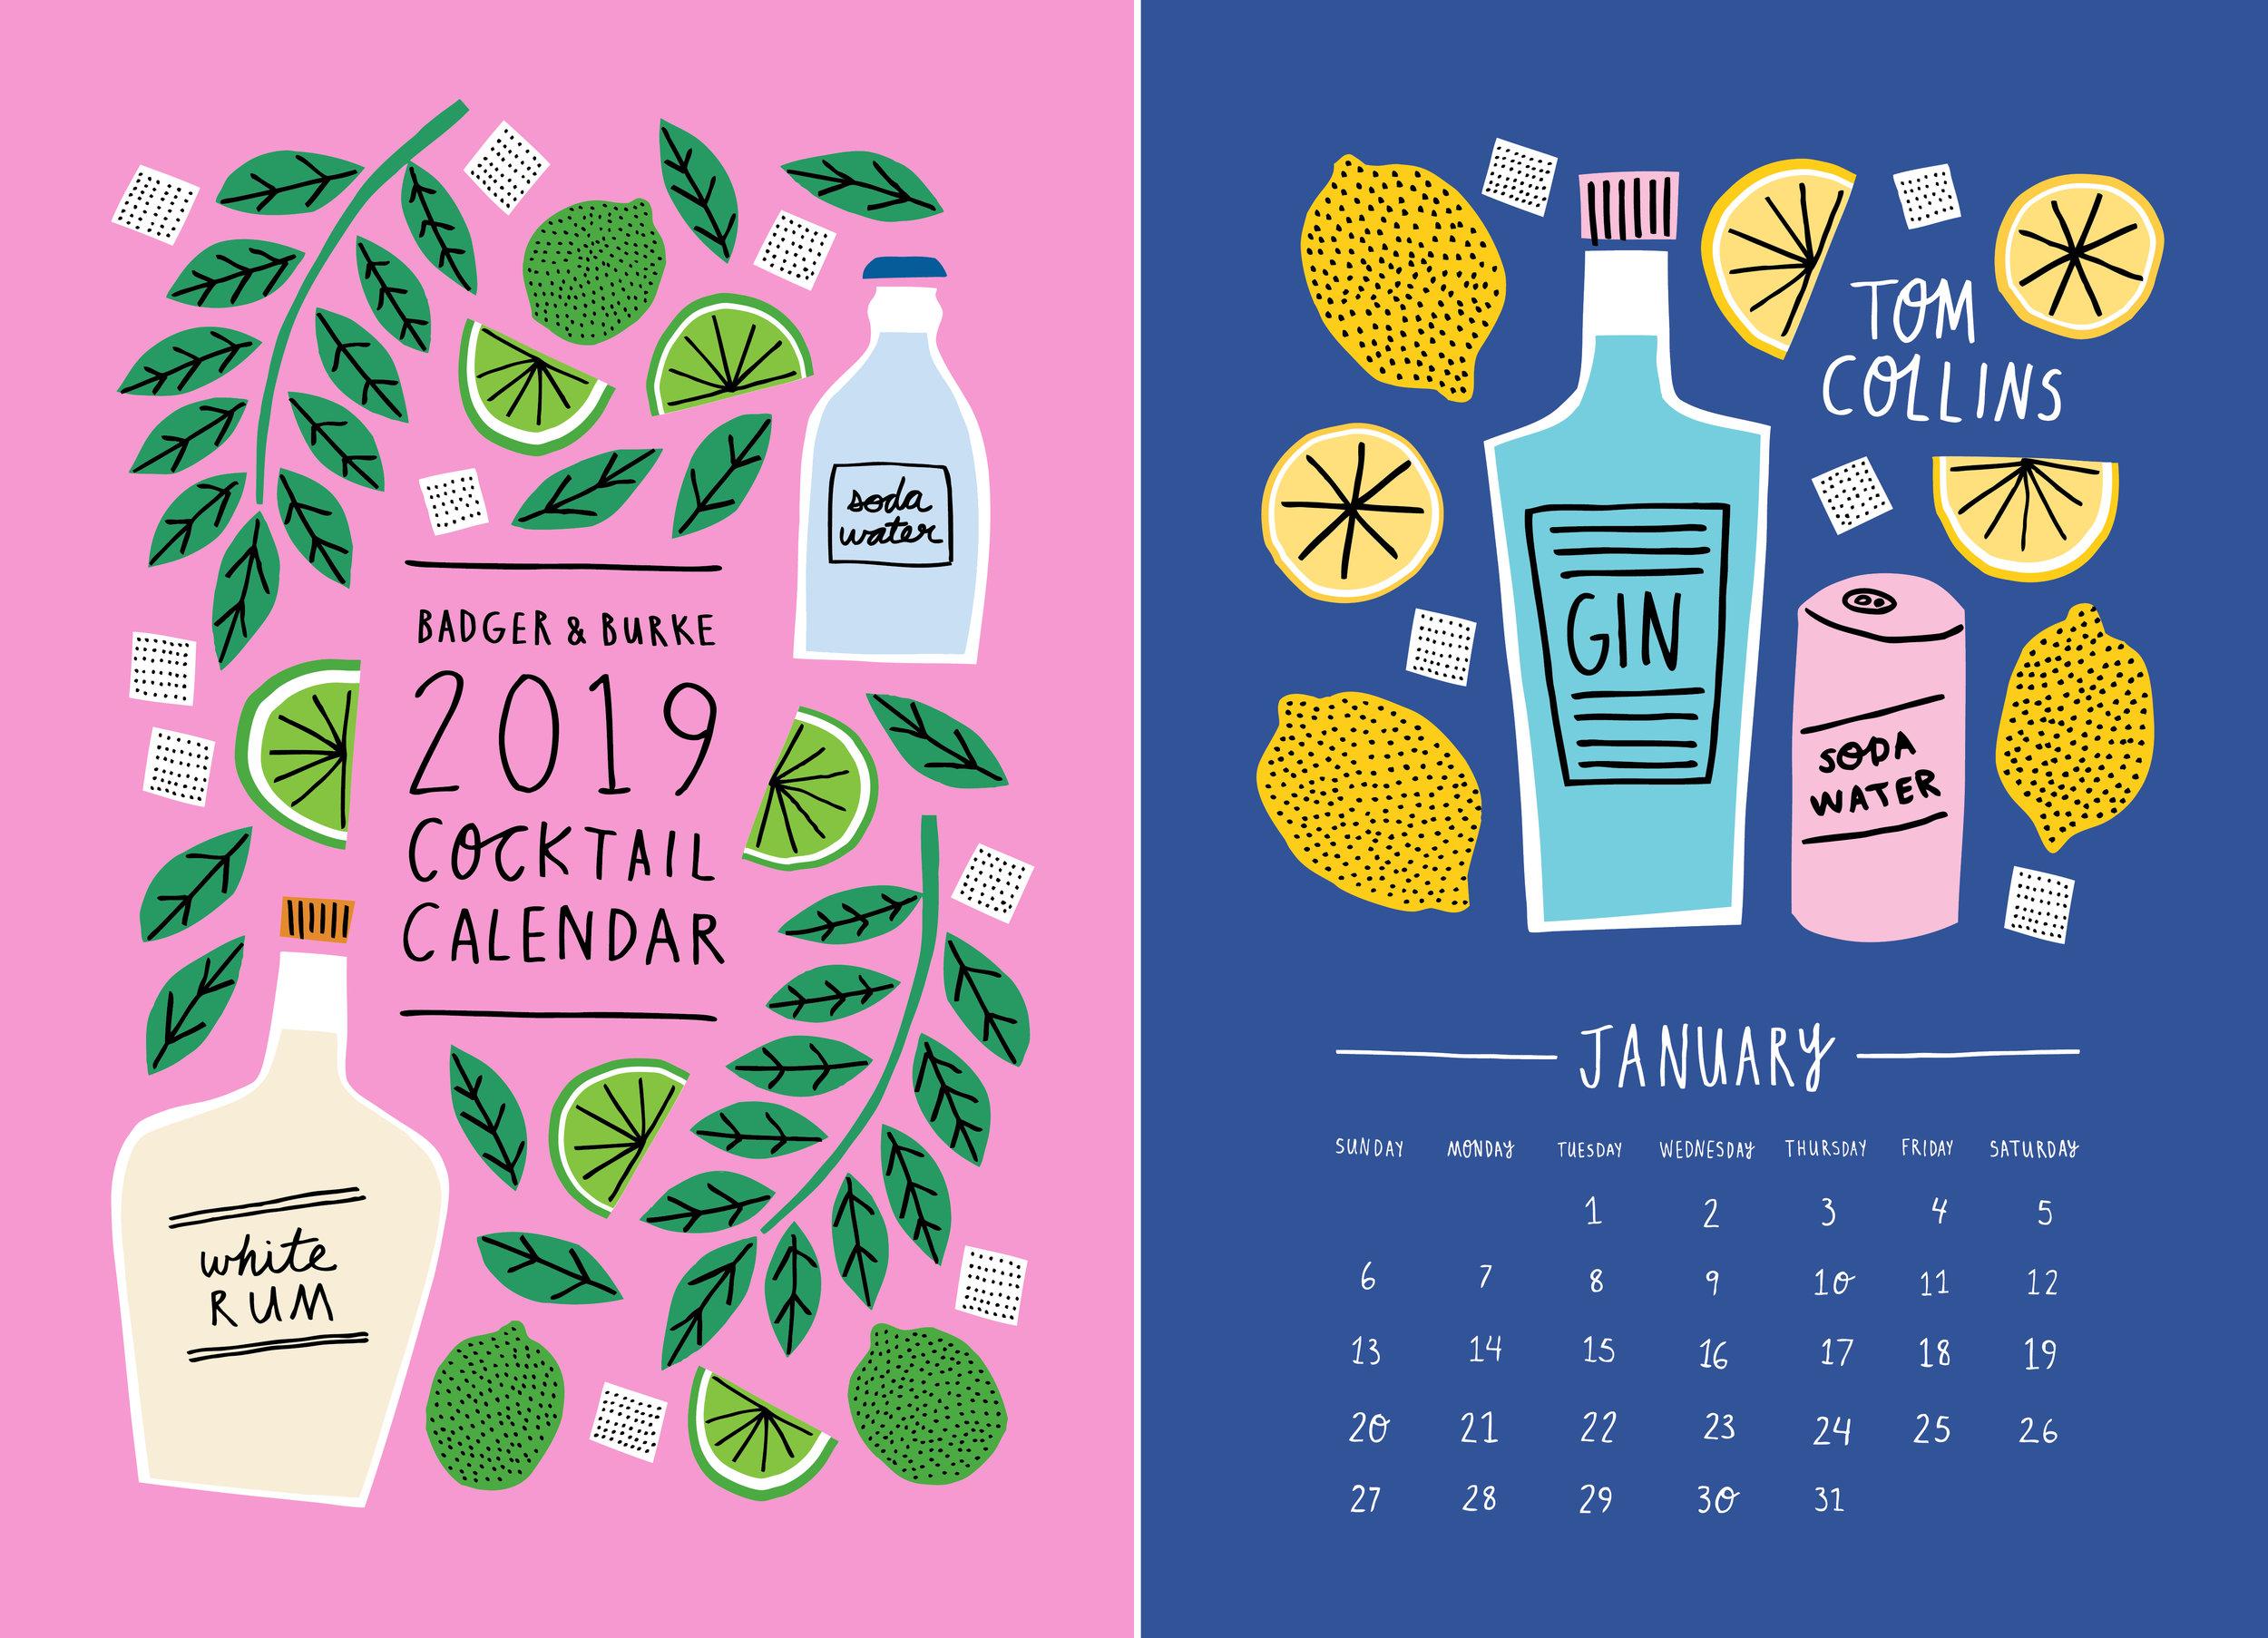 Badger & Burke Calendars